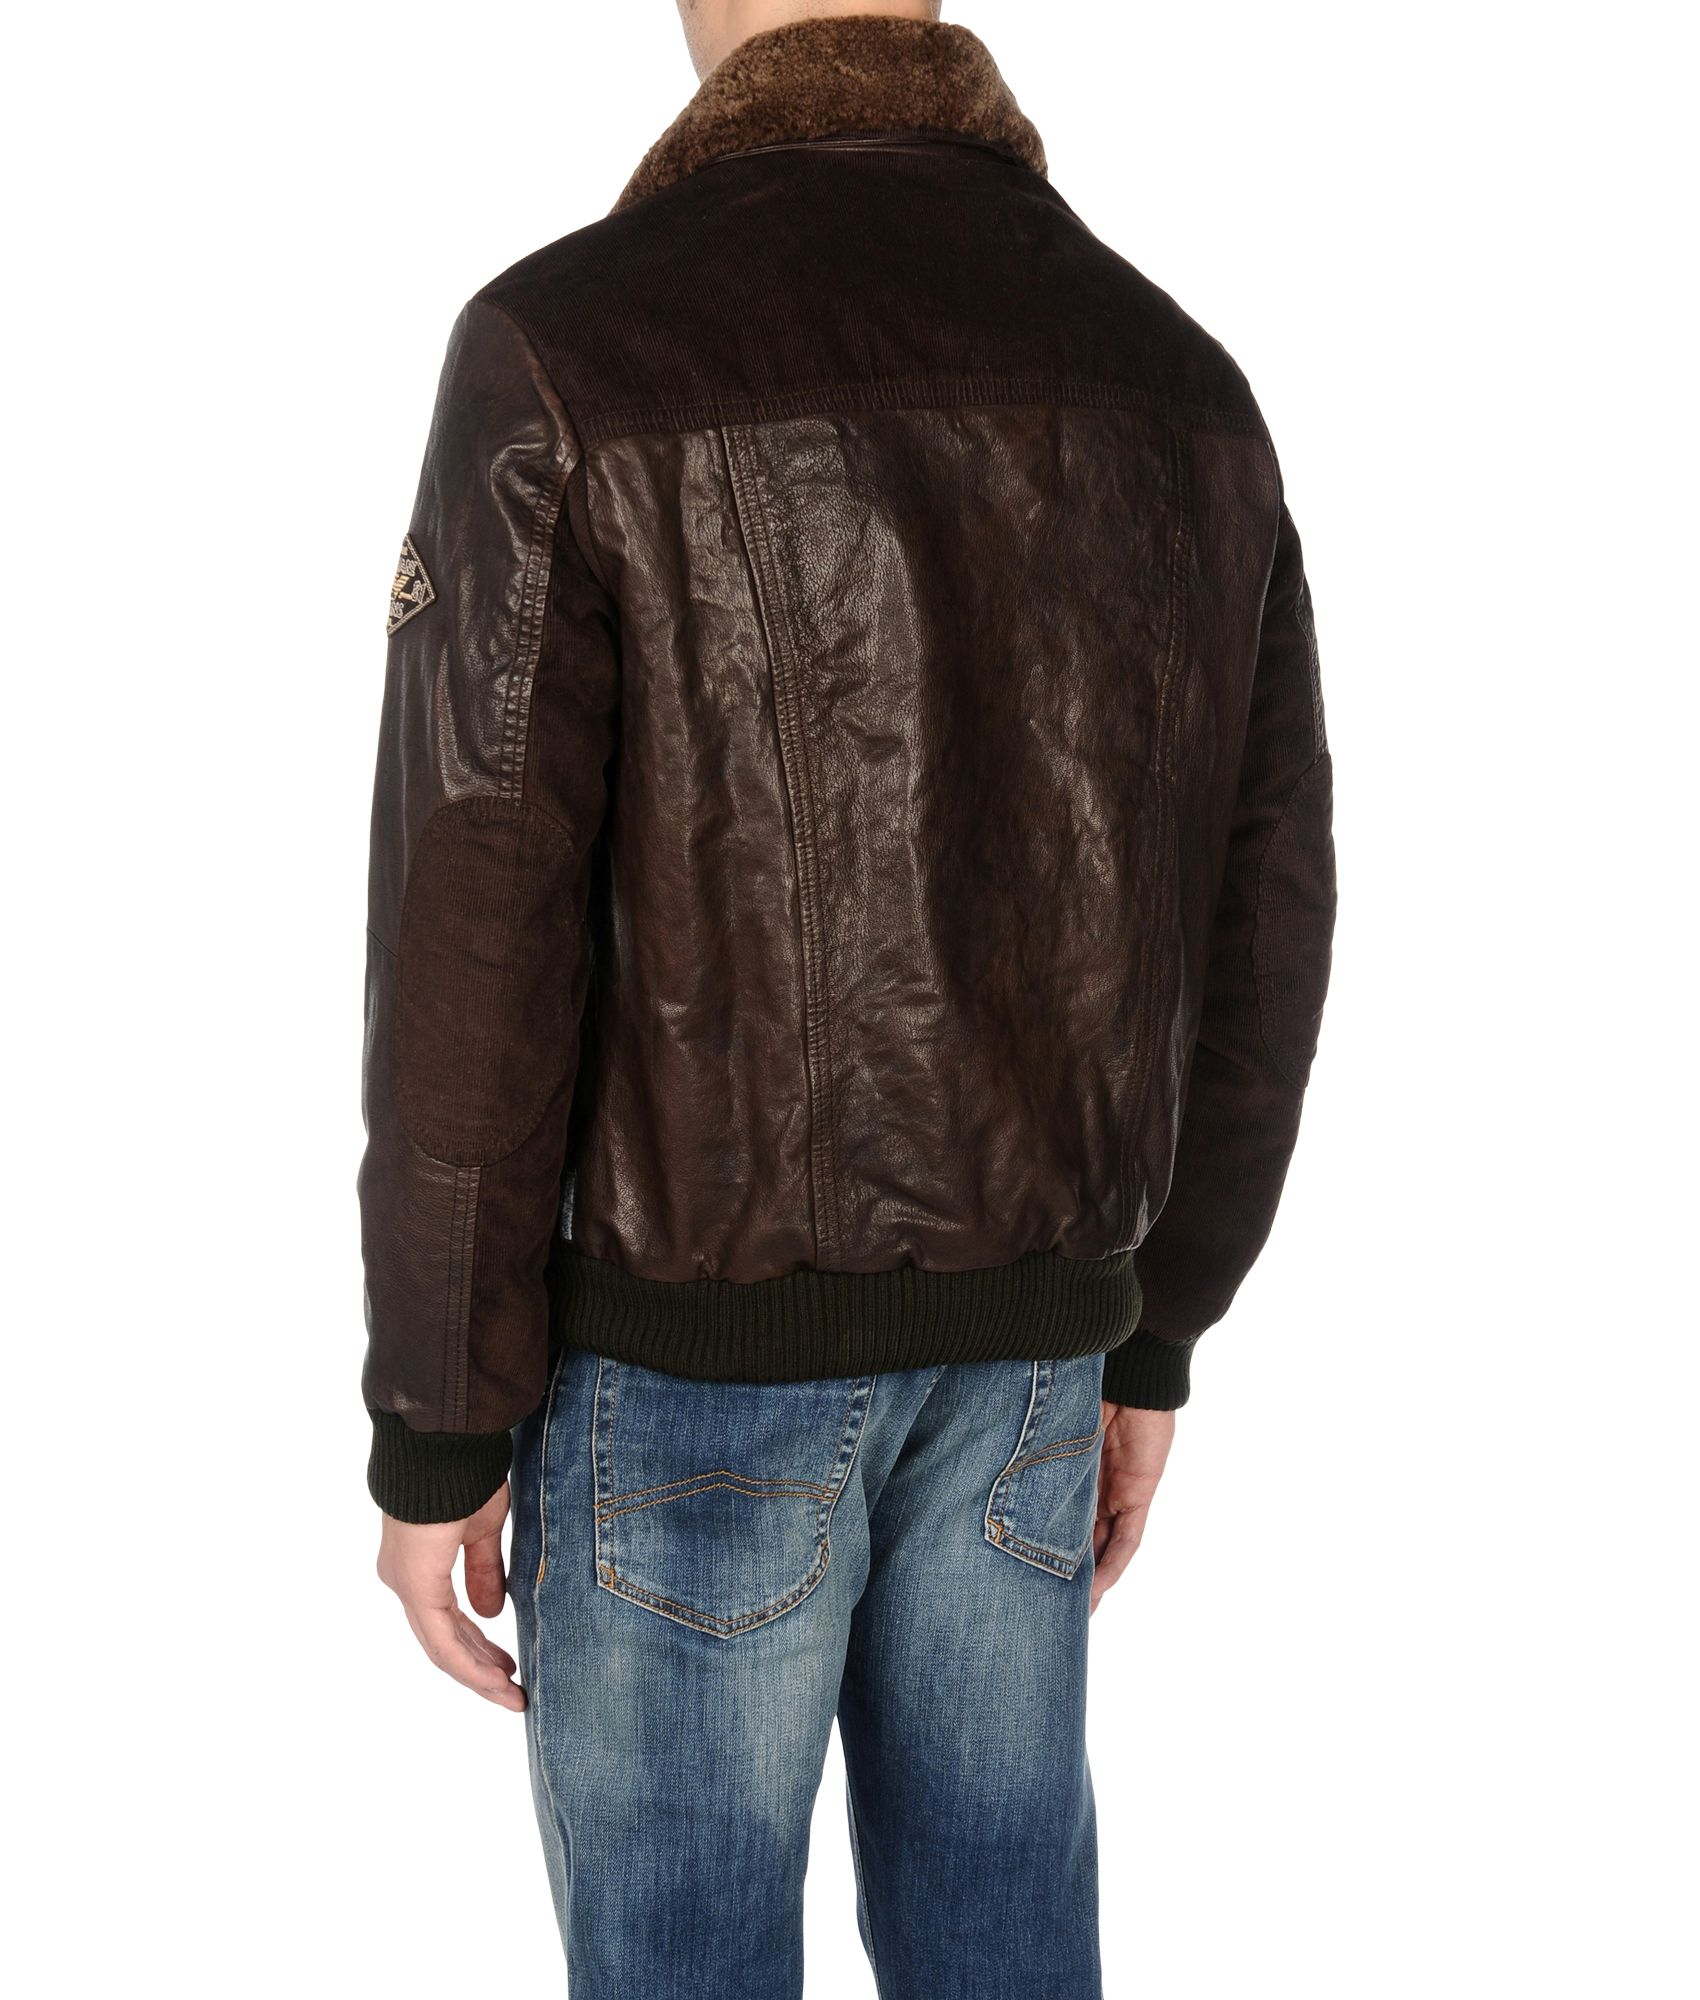 Armani brown leather jacket